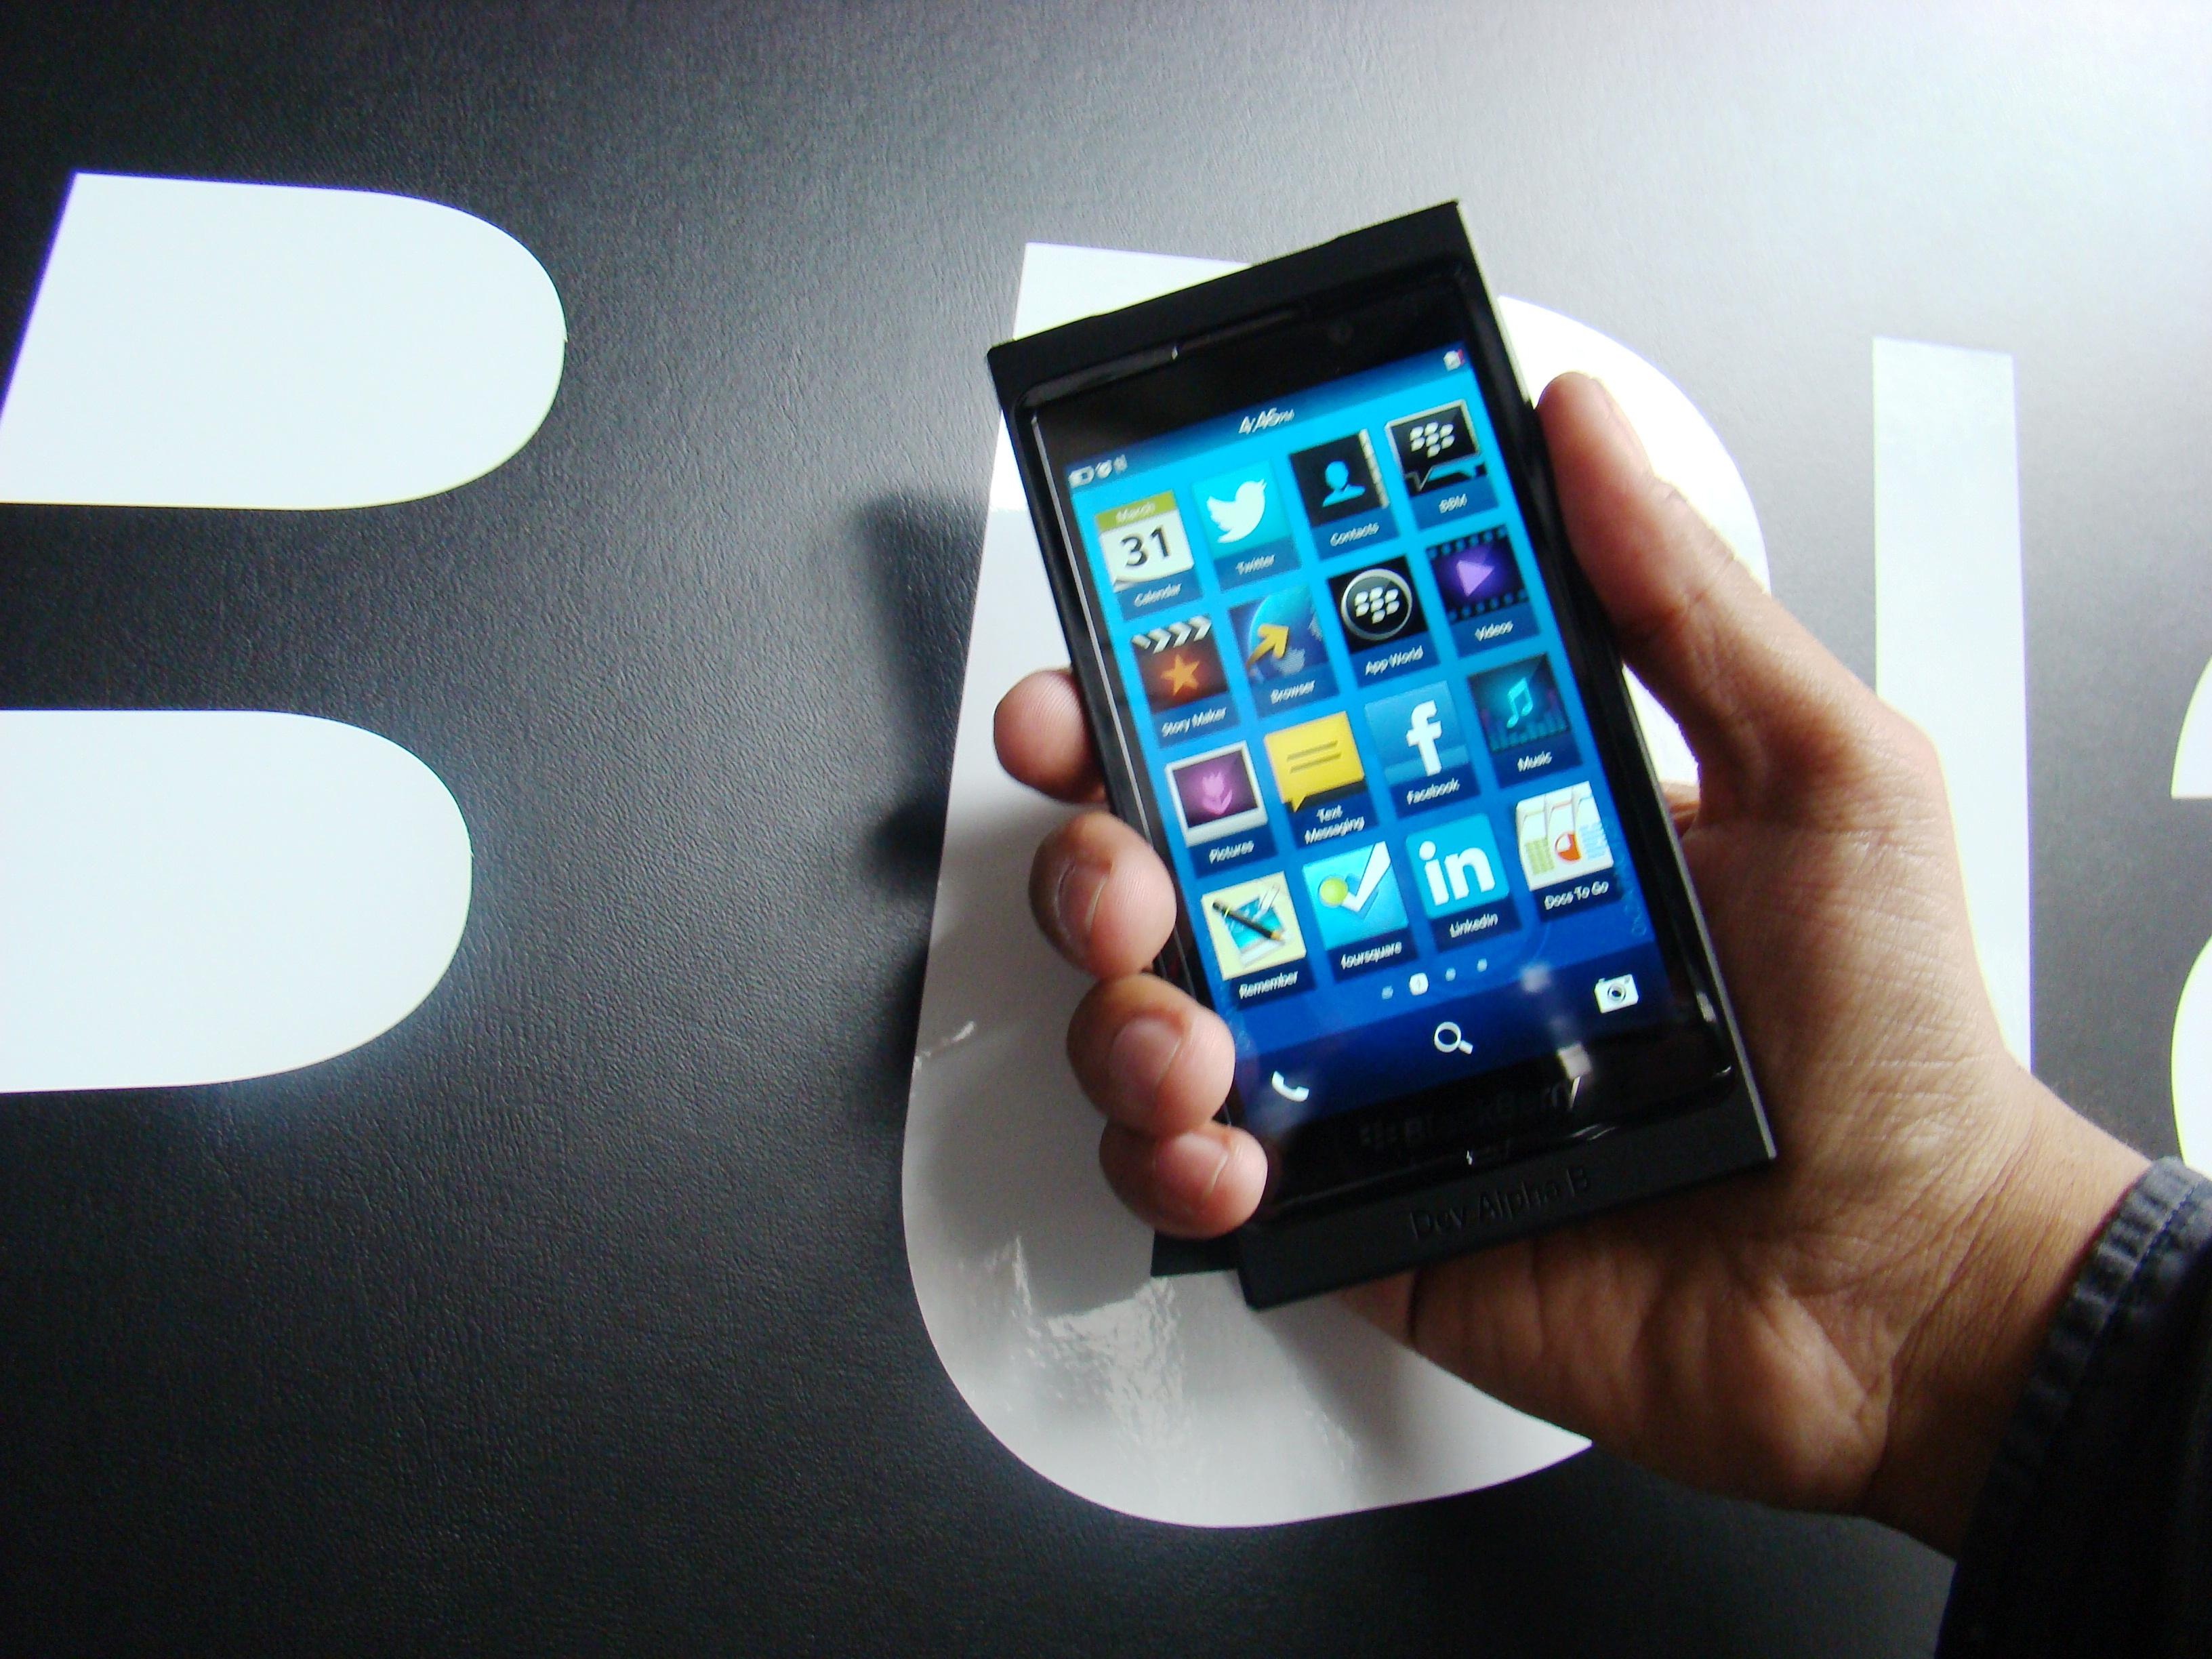 BlackBerry 10 21